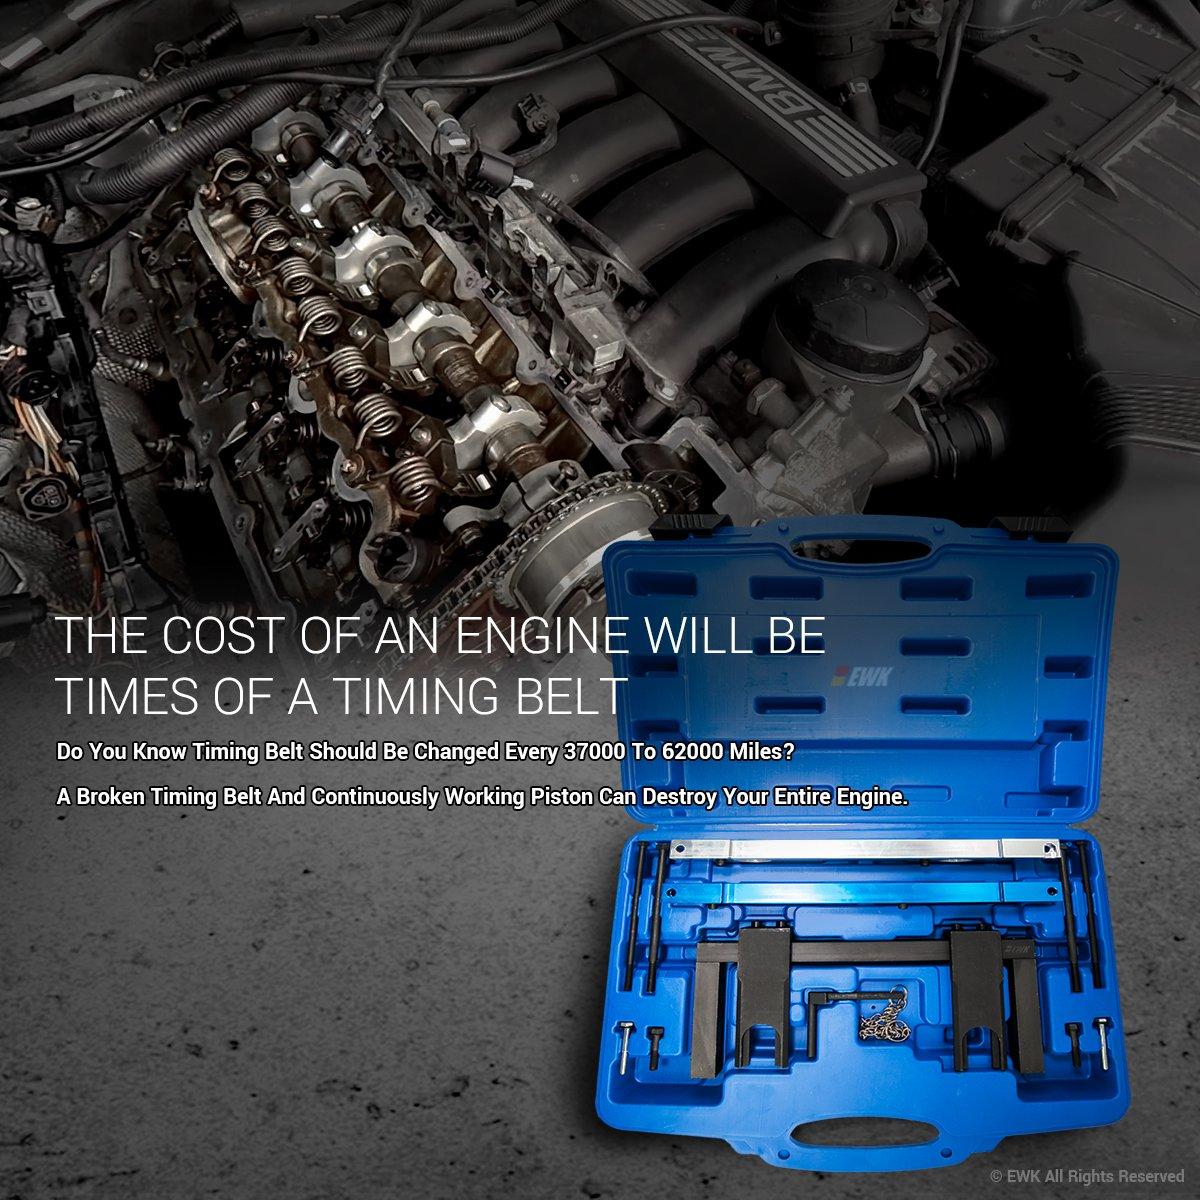 Ewk Engine Timing Cam Camshaft Alignment Locking Tool 2008 Mini Cooper Belt Kit For Bmw N51 N52 N53 N54 110300 114280 114290 118520 Automotive